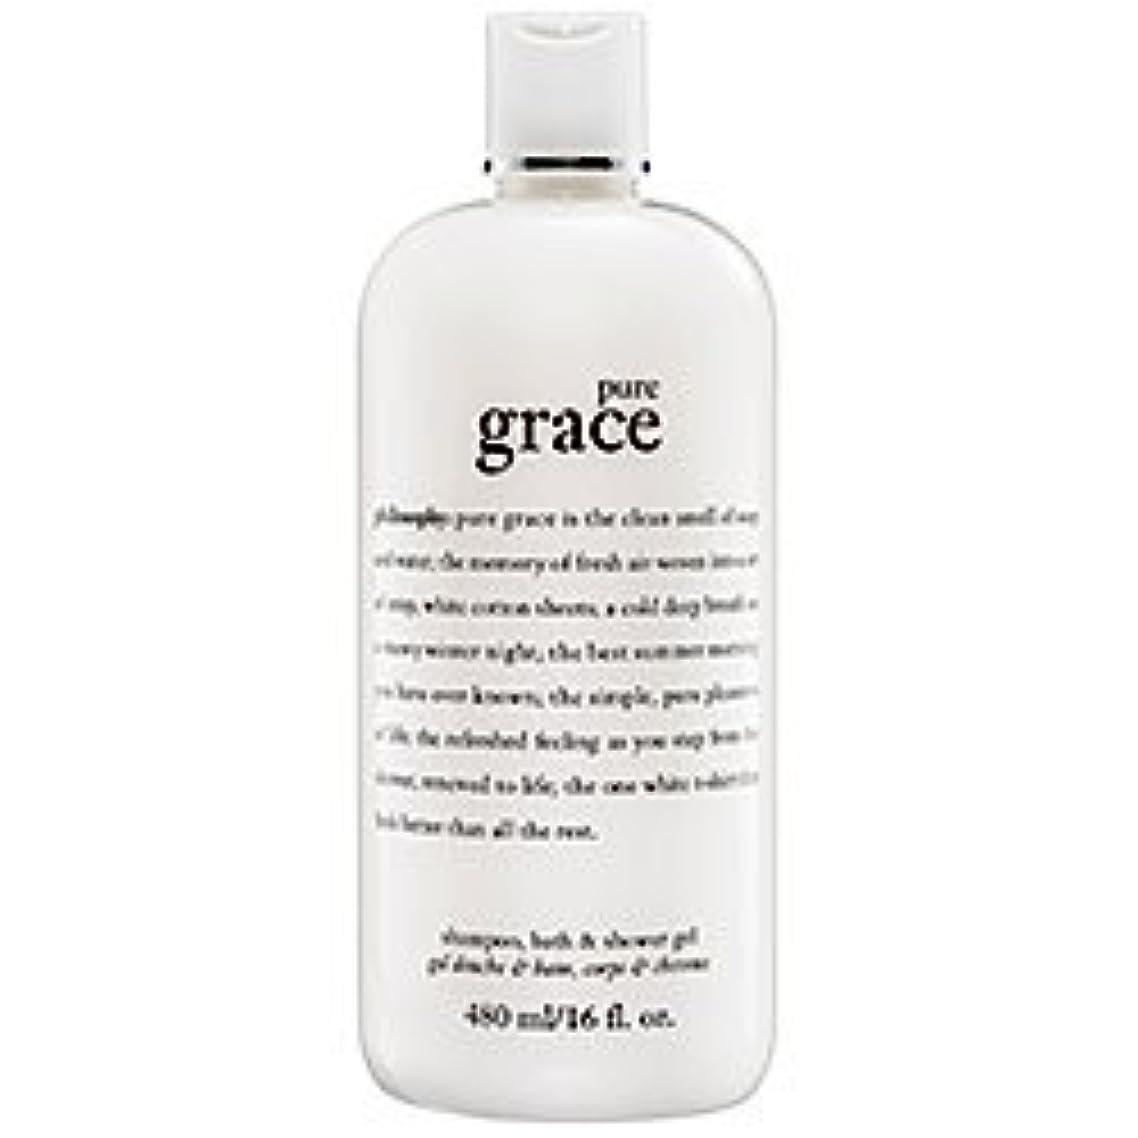 pure grace (ピュアグレイス ) 16.0 oz (480ml) foaming bath and shower gel for Women